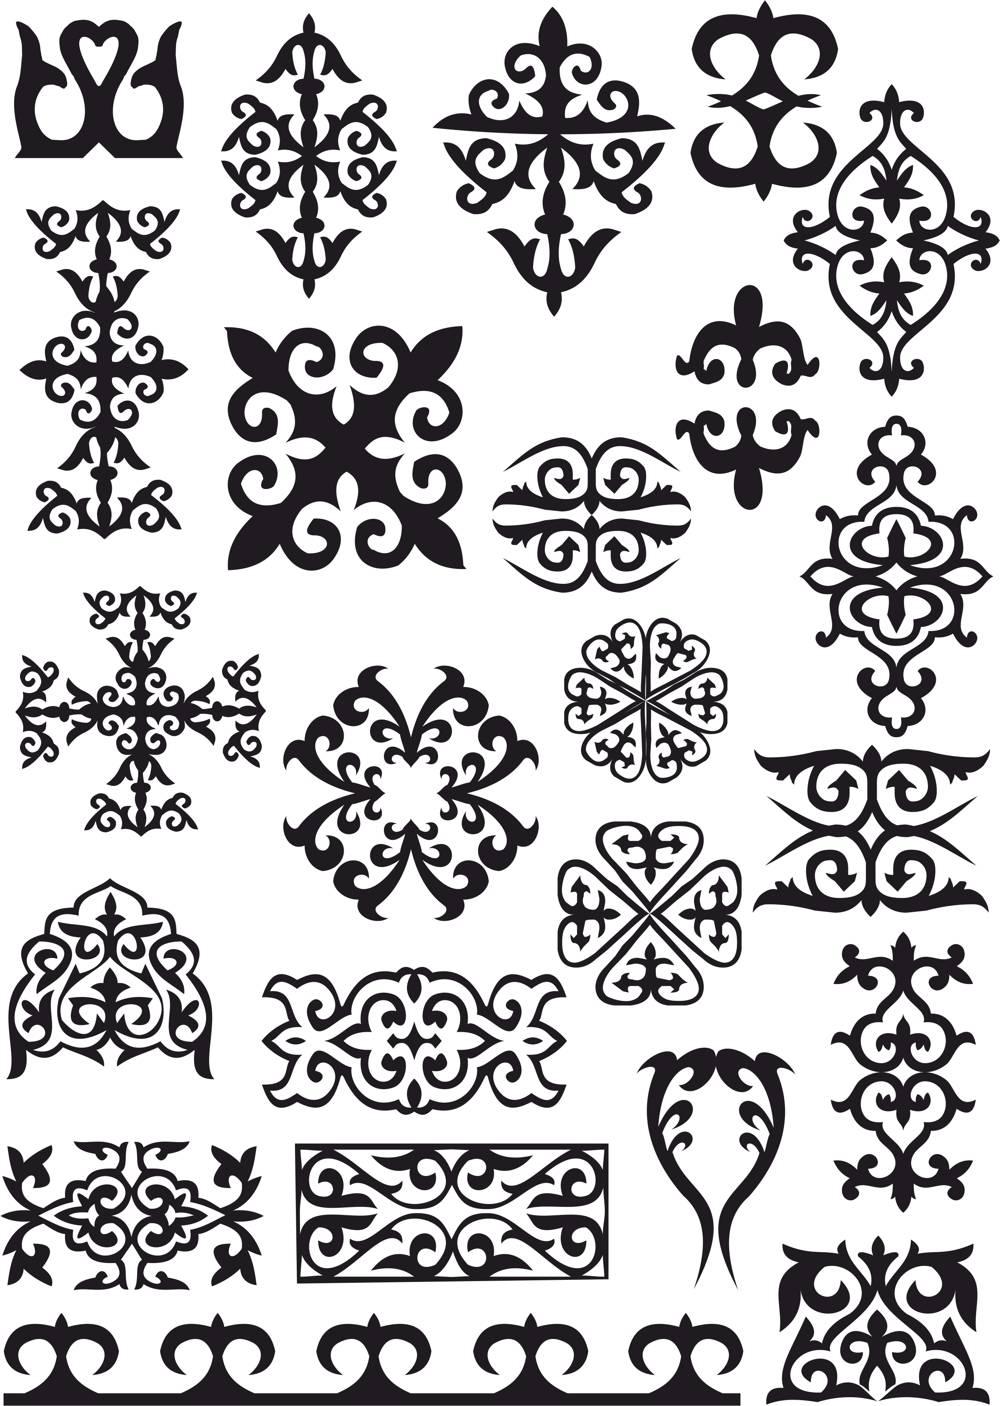 Kazakh Ornaments Patterns CDR File